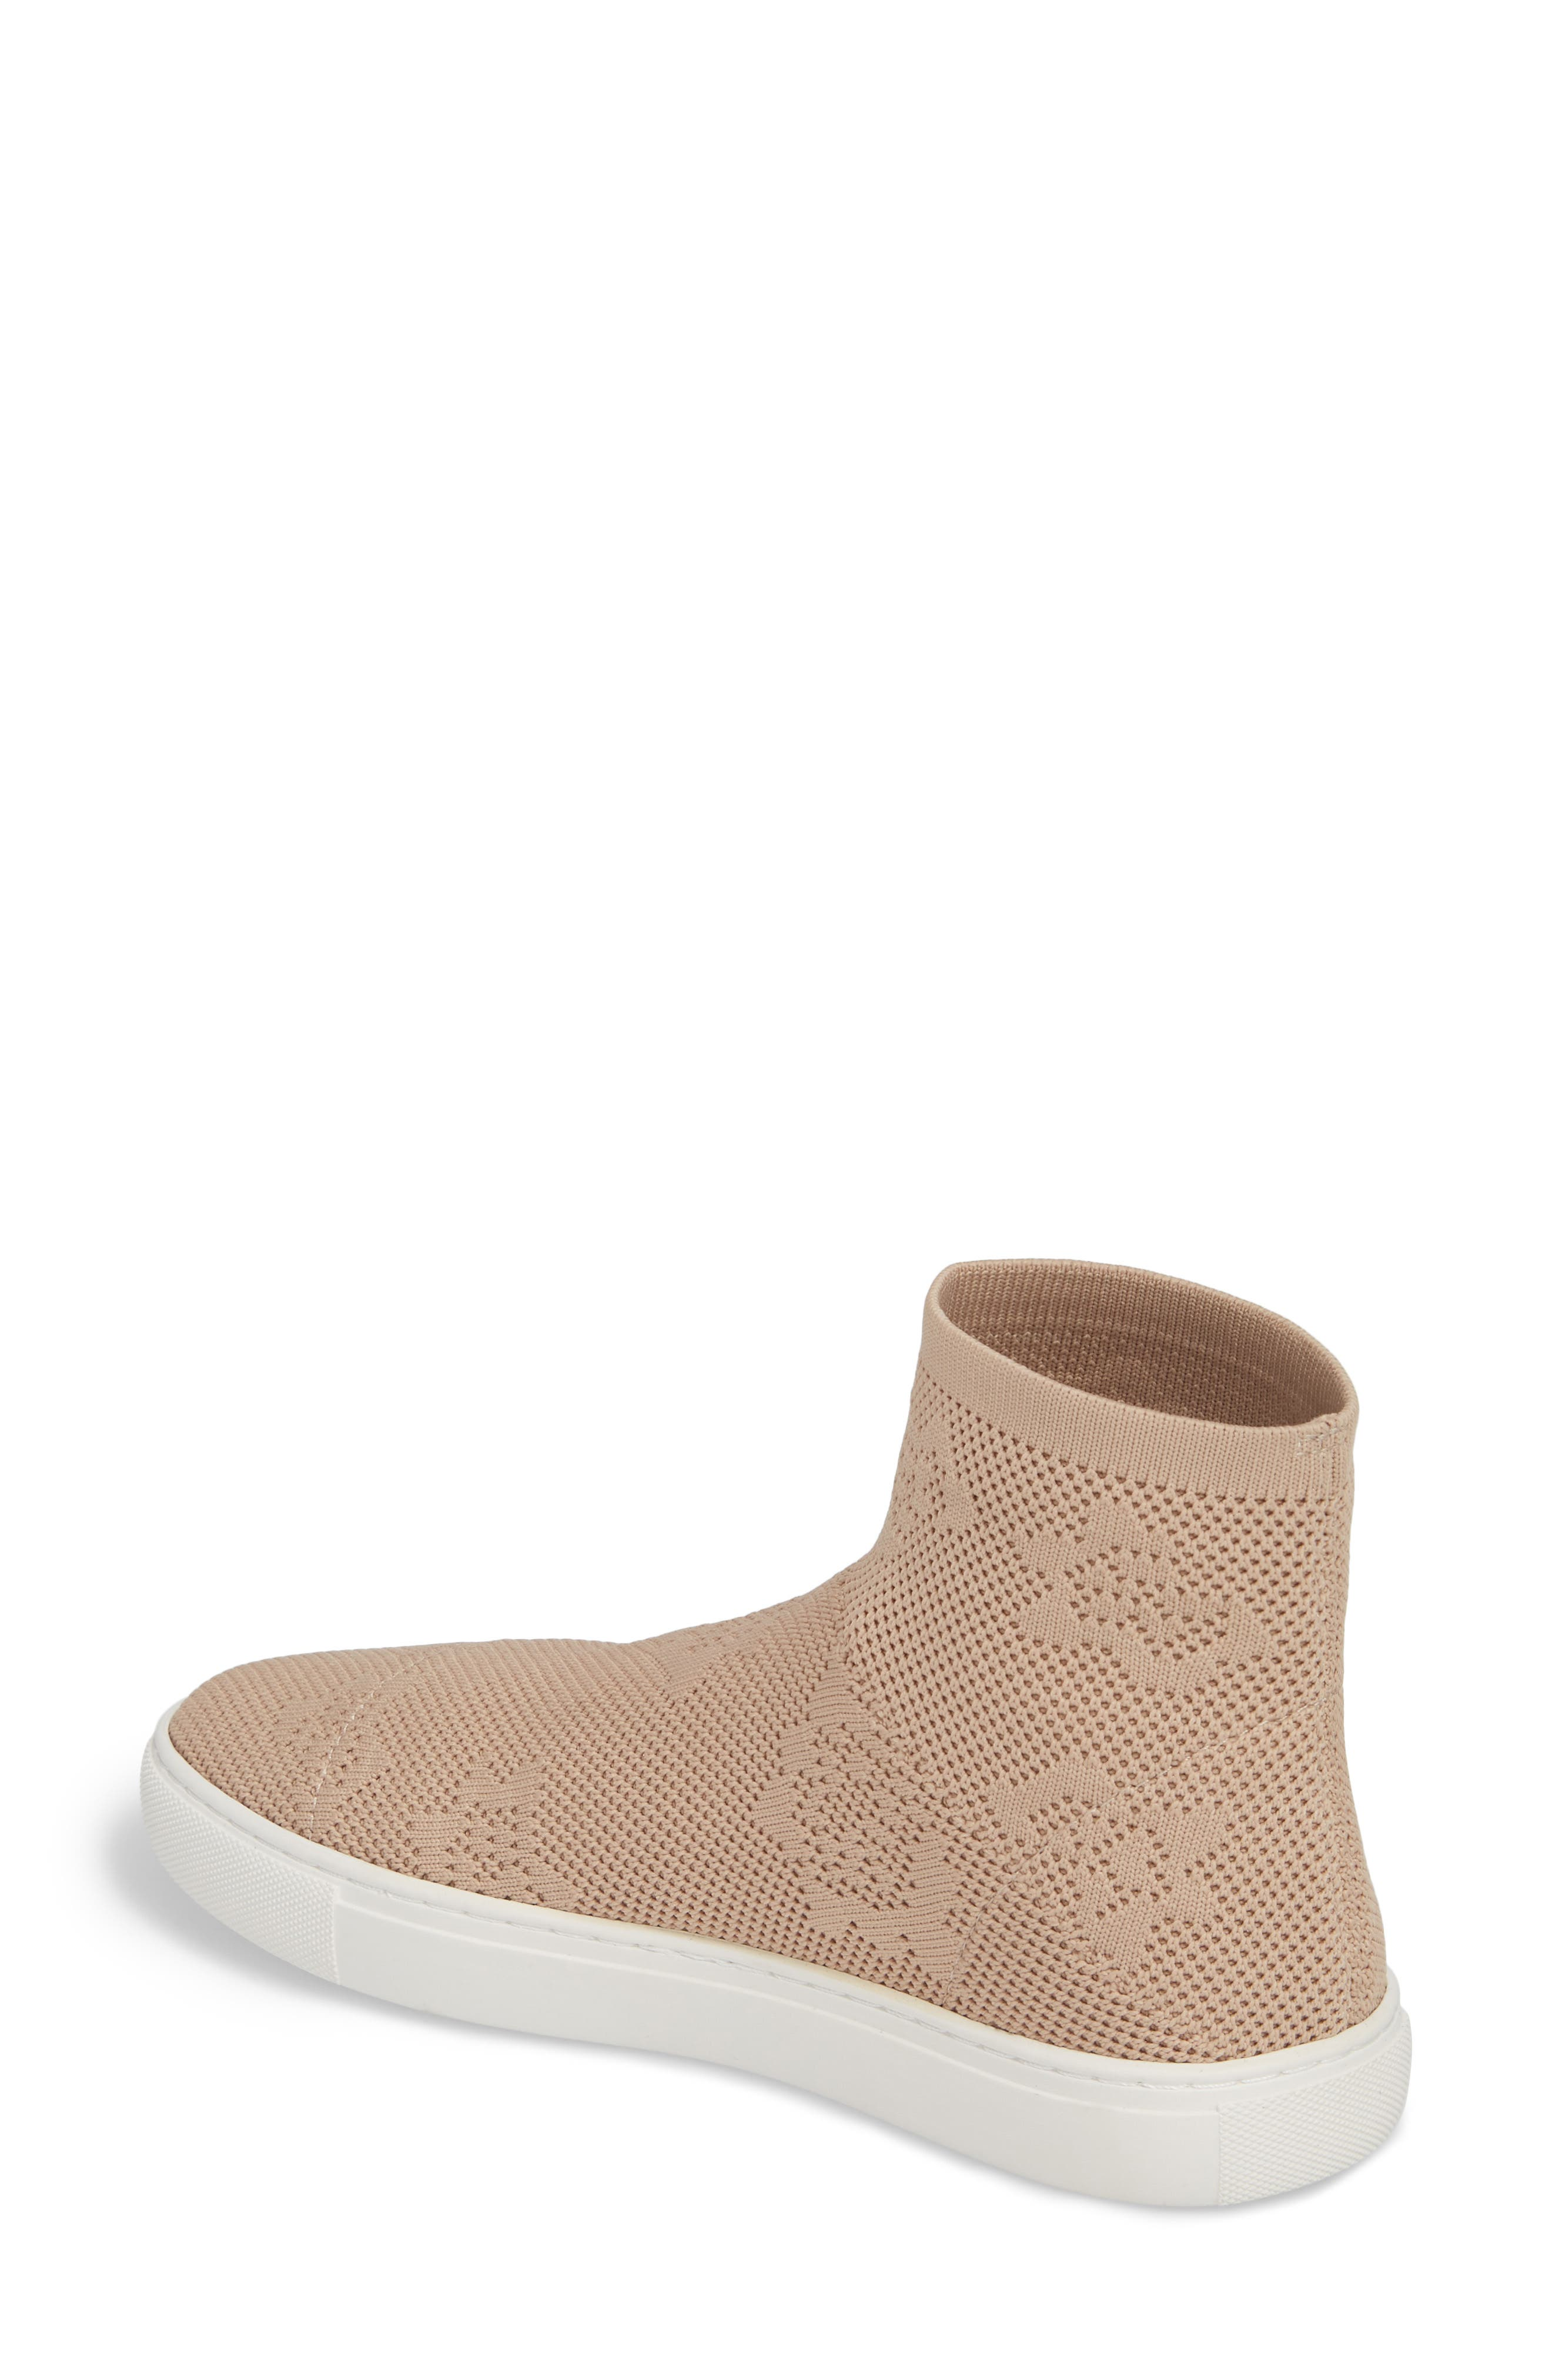 Keating Sneaker,                             Alternate thumbnail 6, color,